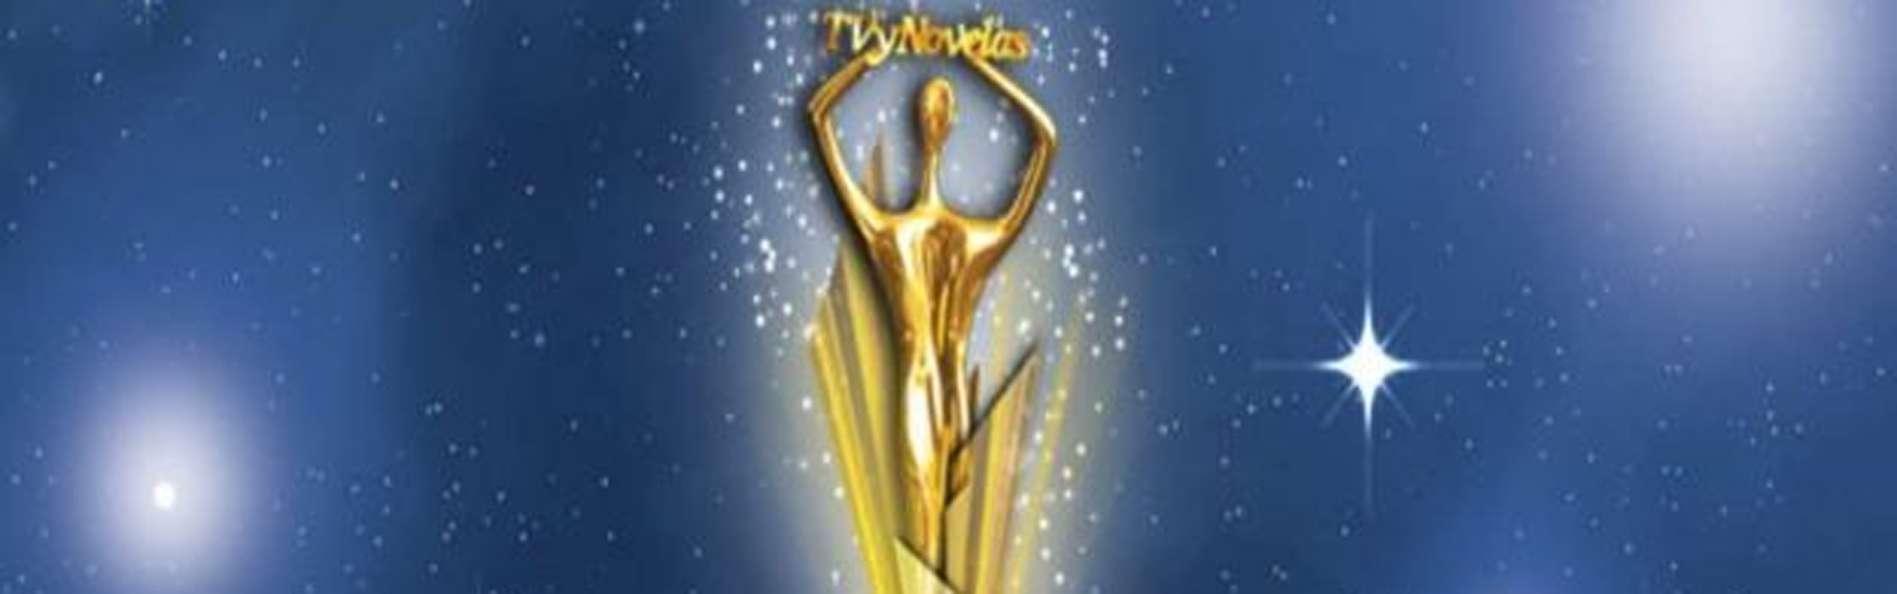 Premios TVyNovelas 2015 Foto: Facebook/ Premios TVyNovelas